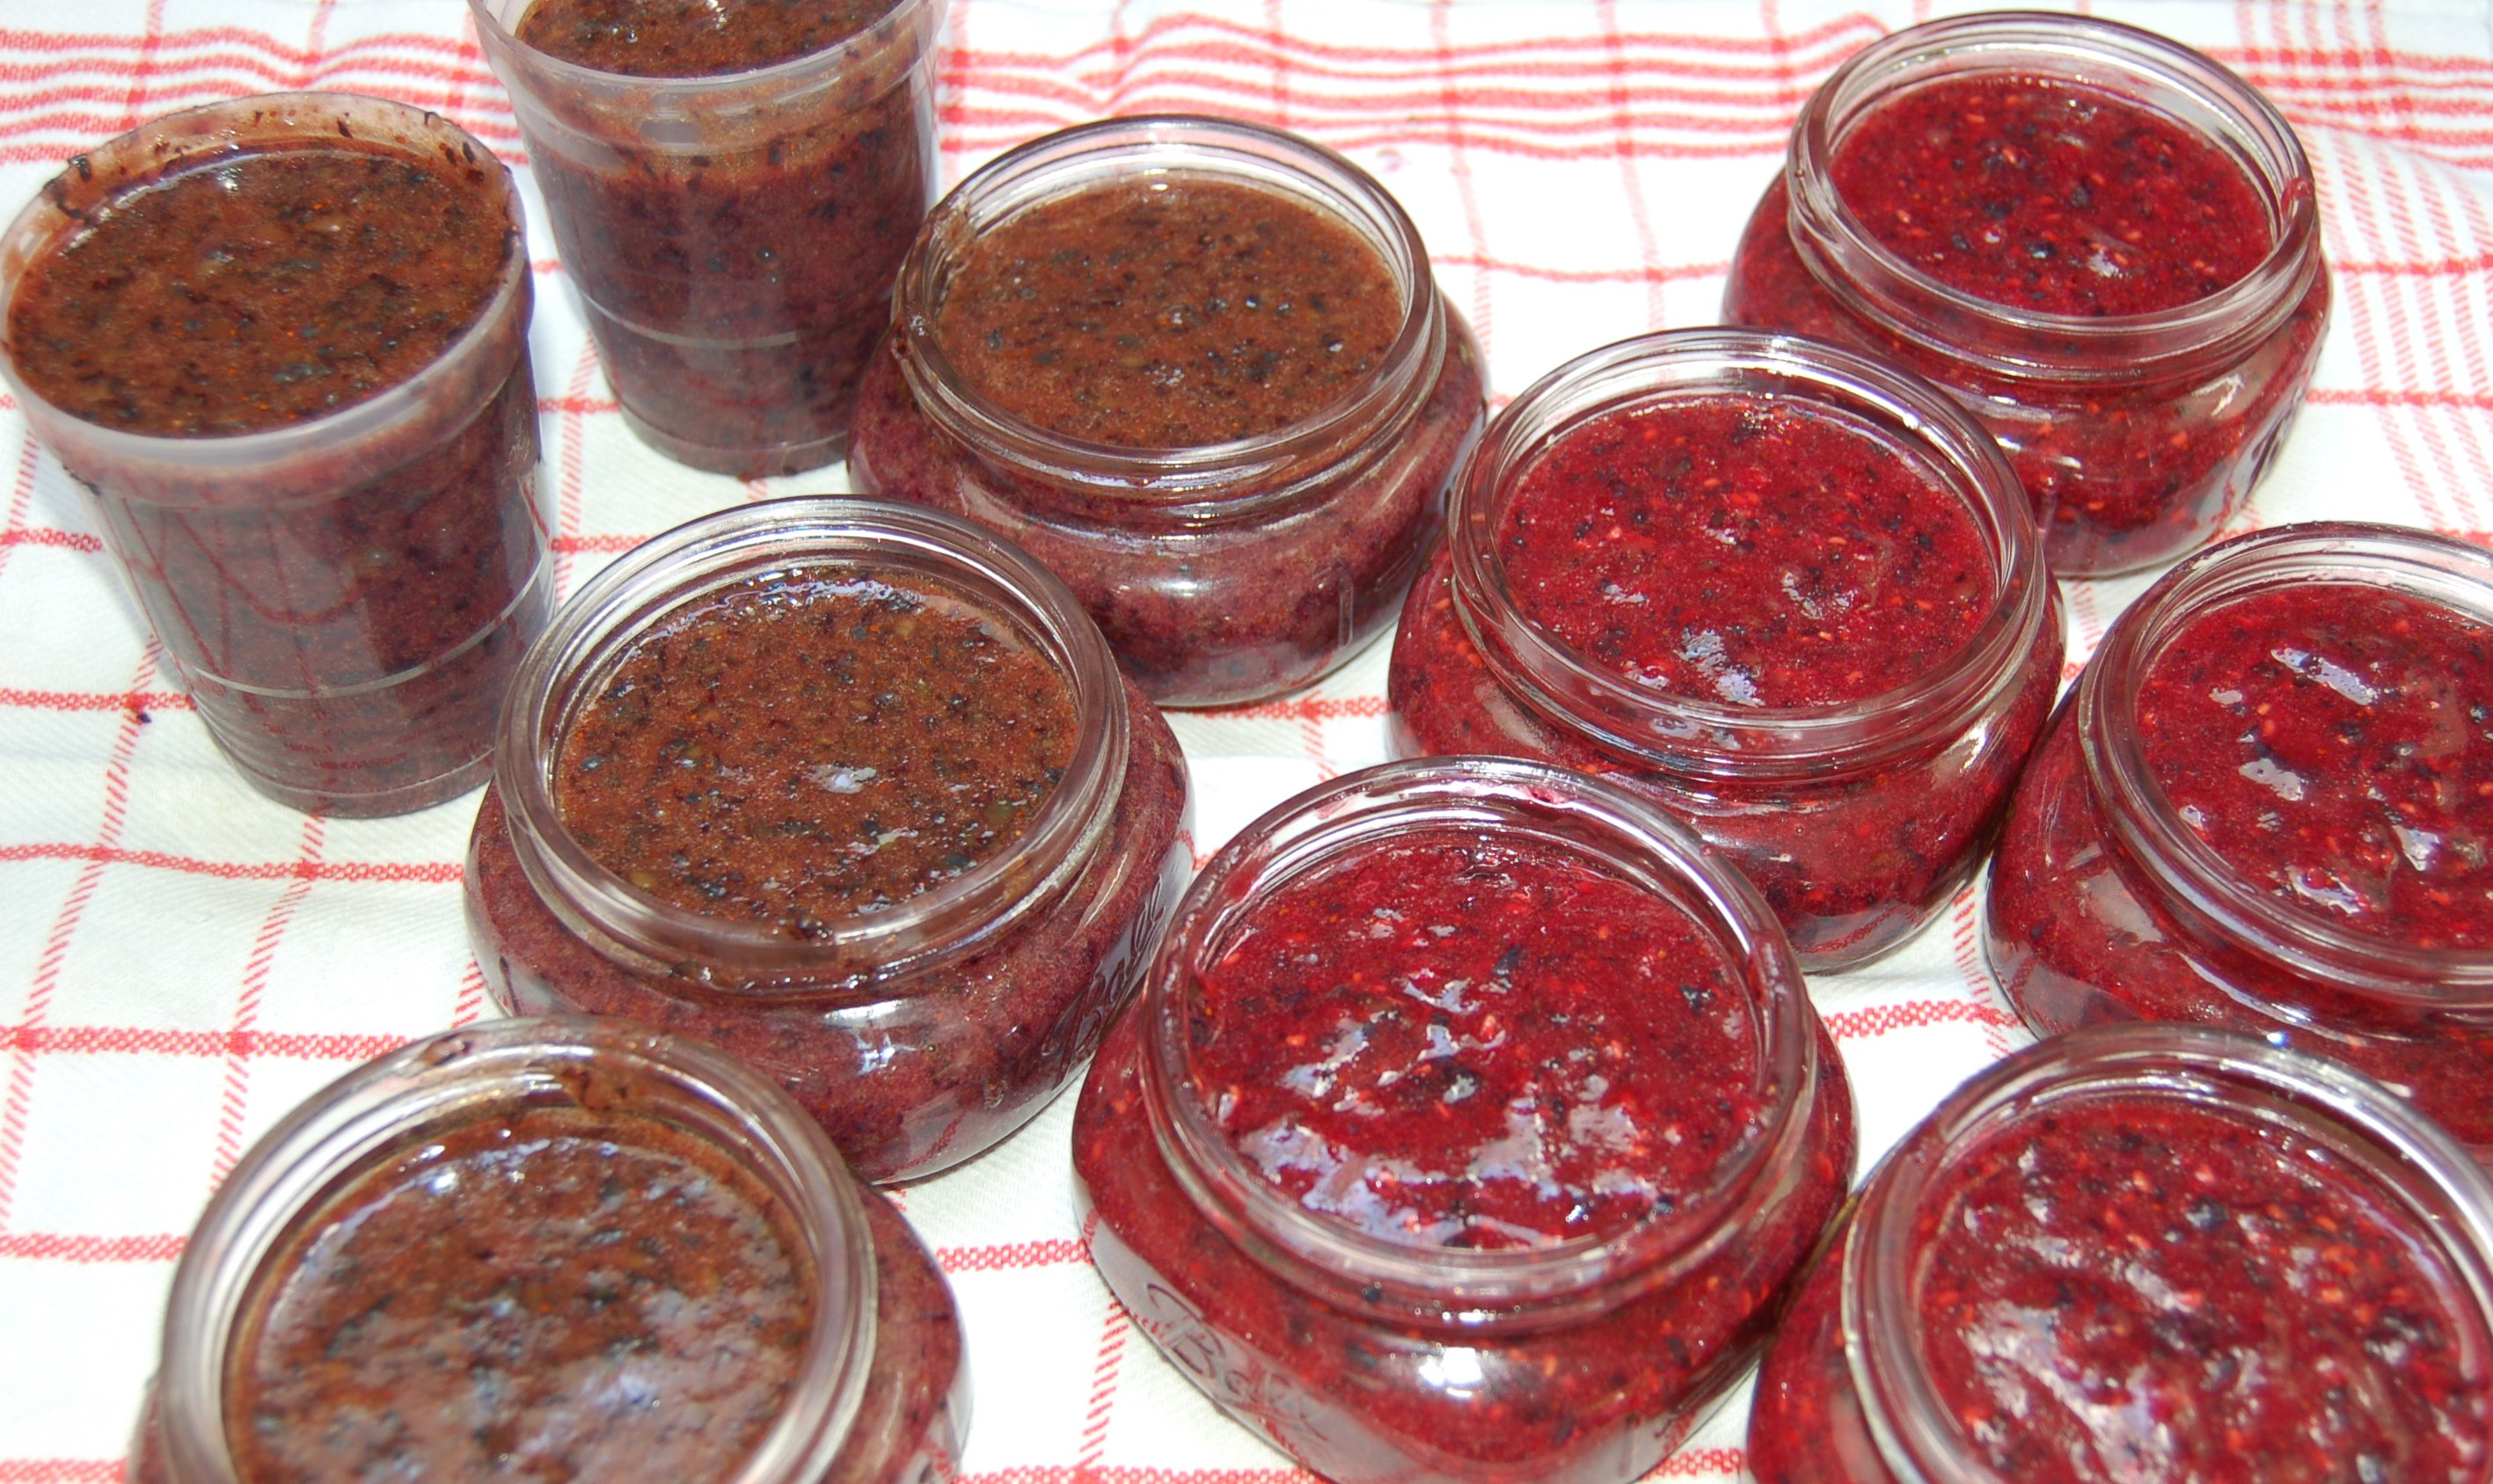 Berry jam setting up